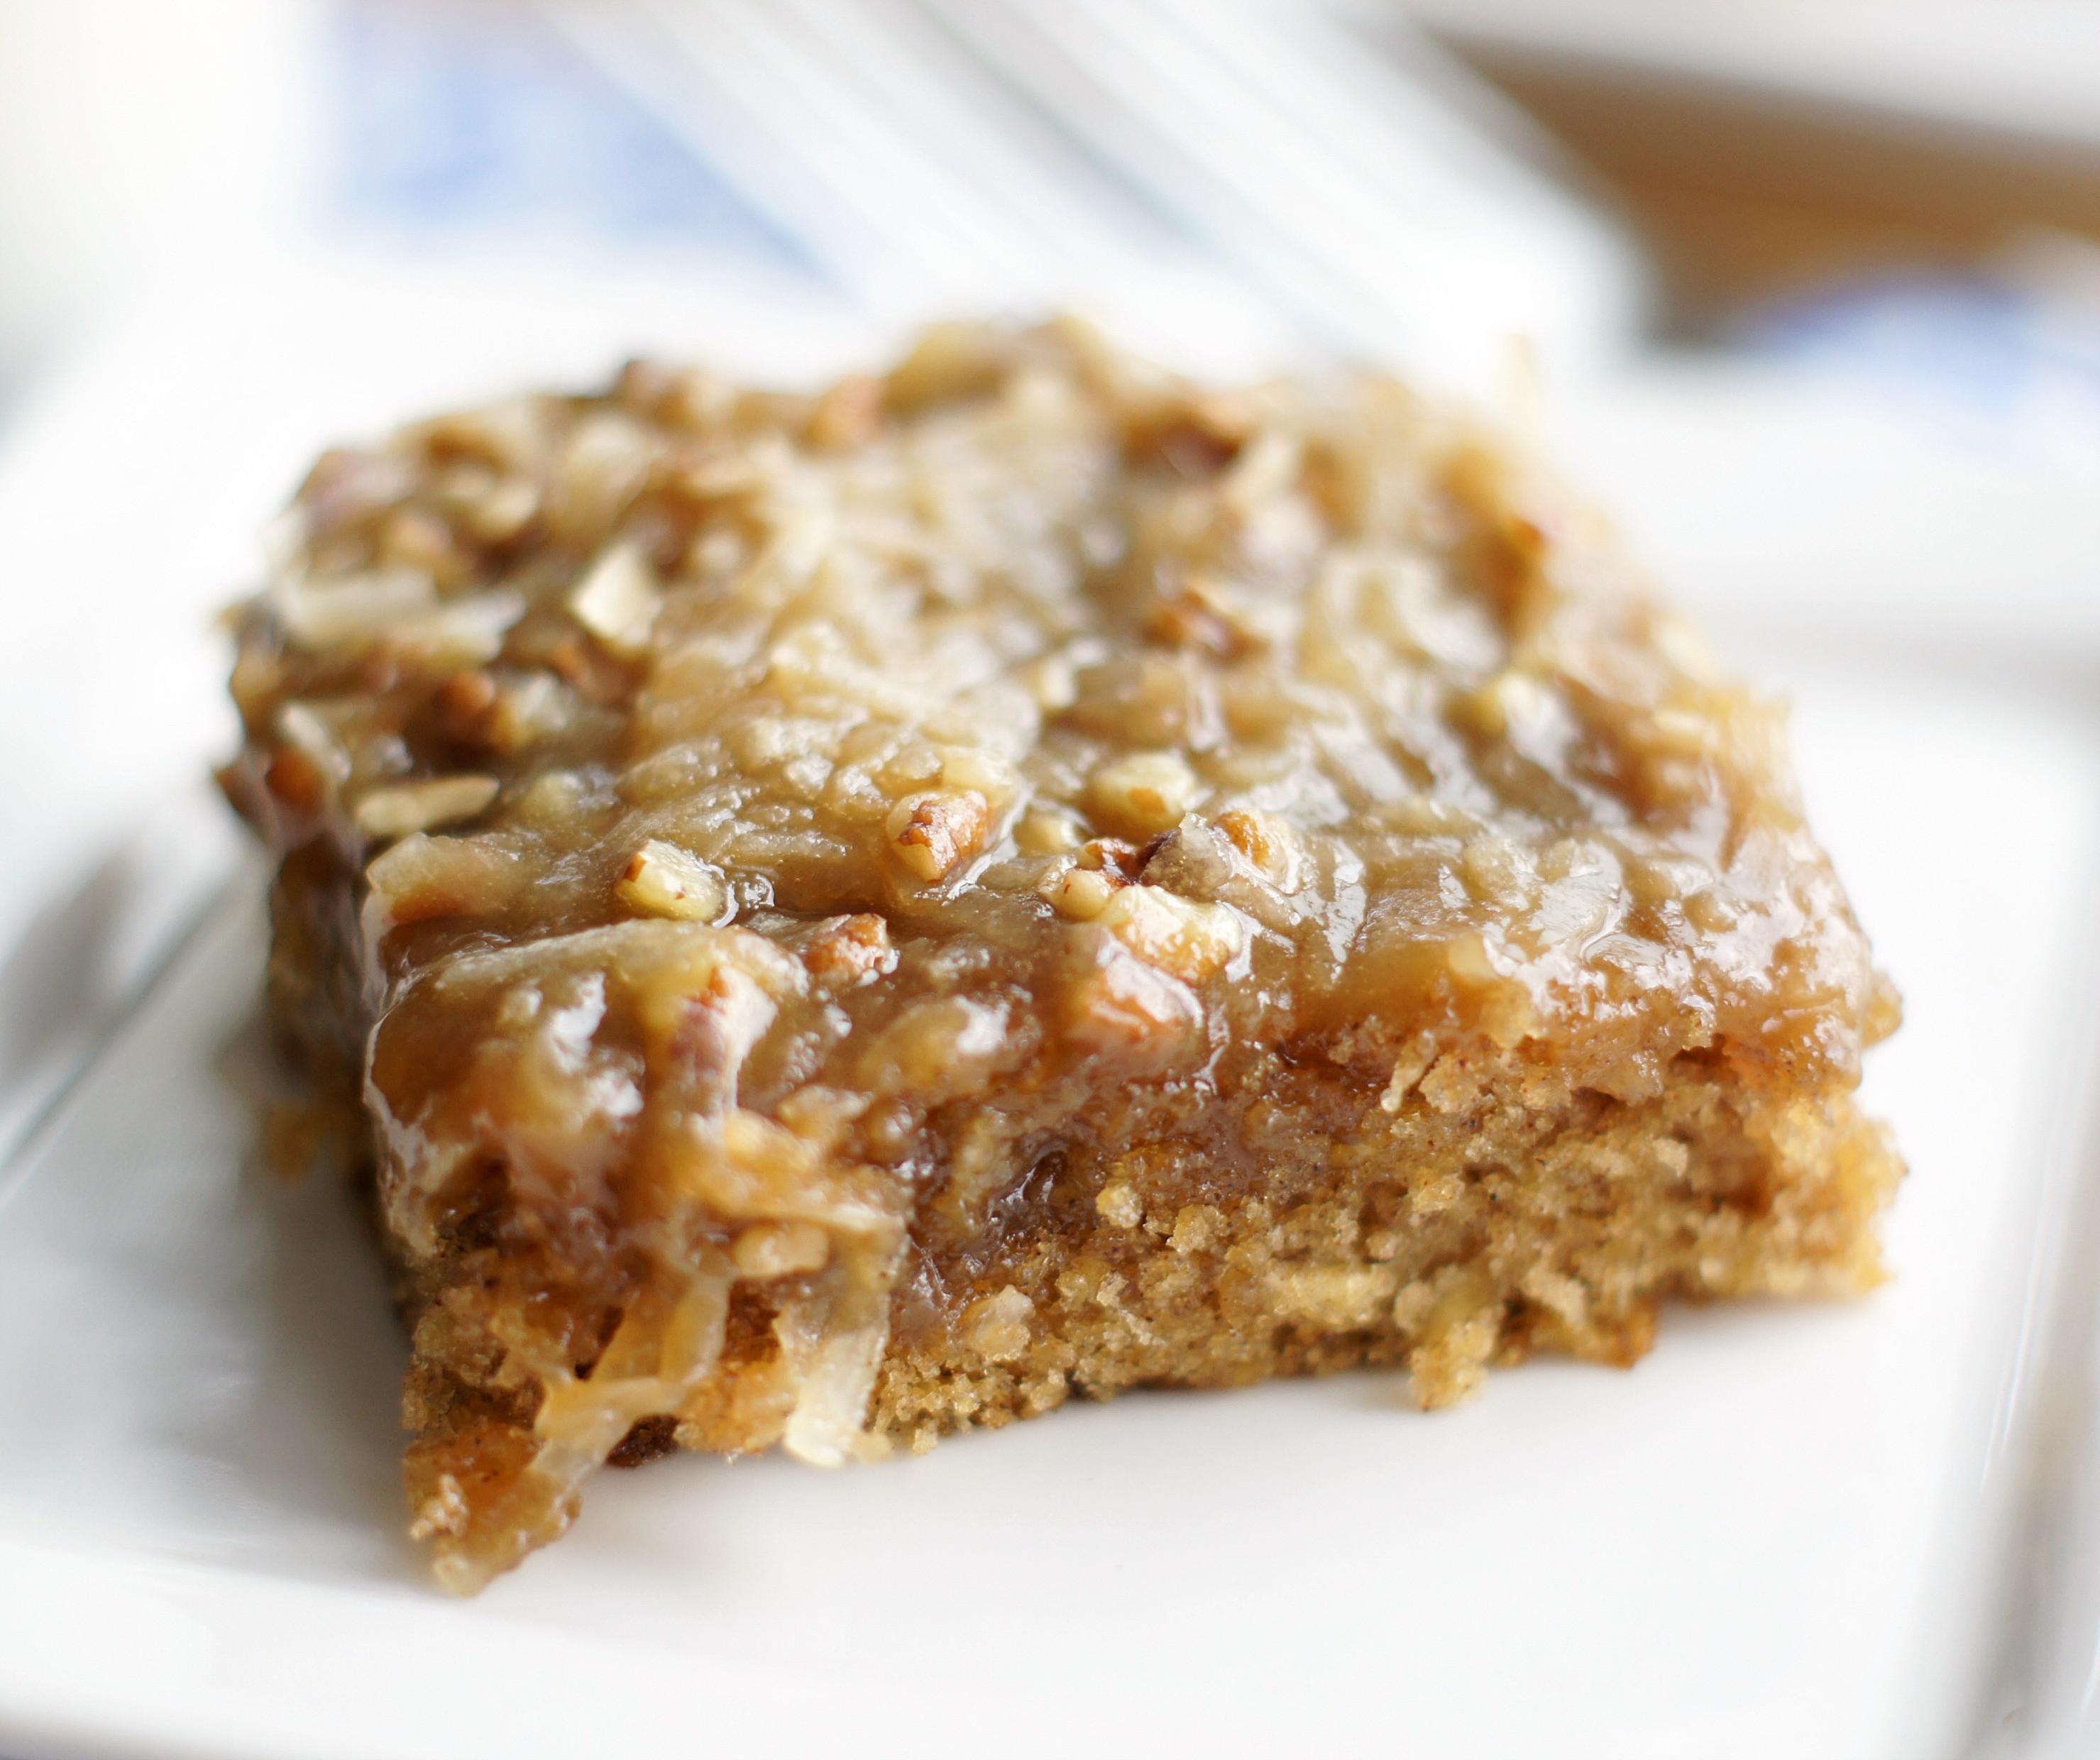 Oatmeal Dessert Recipes  Oatmeal Cake 5 Boys Baker